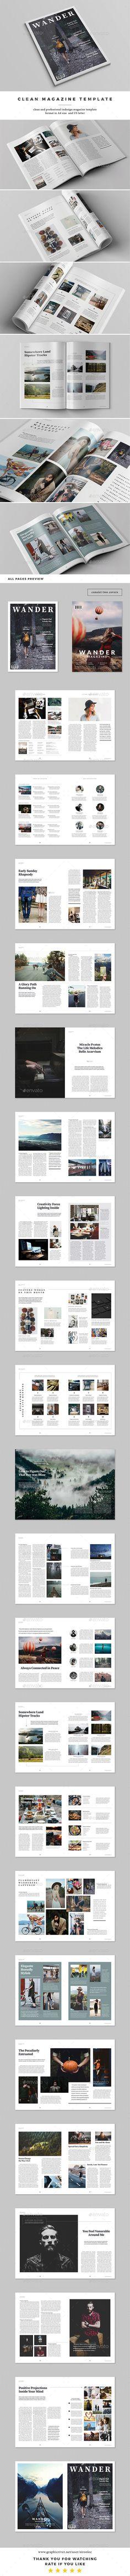 Wander Magazine - Magazines Print Templates Download here : https://graphicriver.net/item/wander-magazine/17430968?s_rank=144&ref=Al-fatih